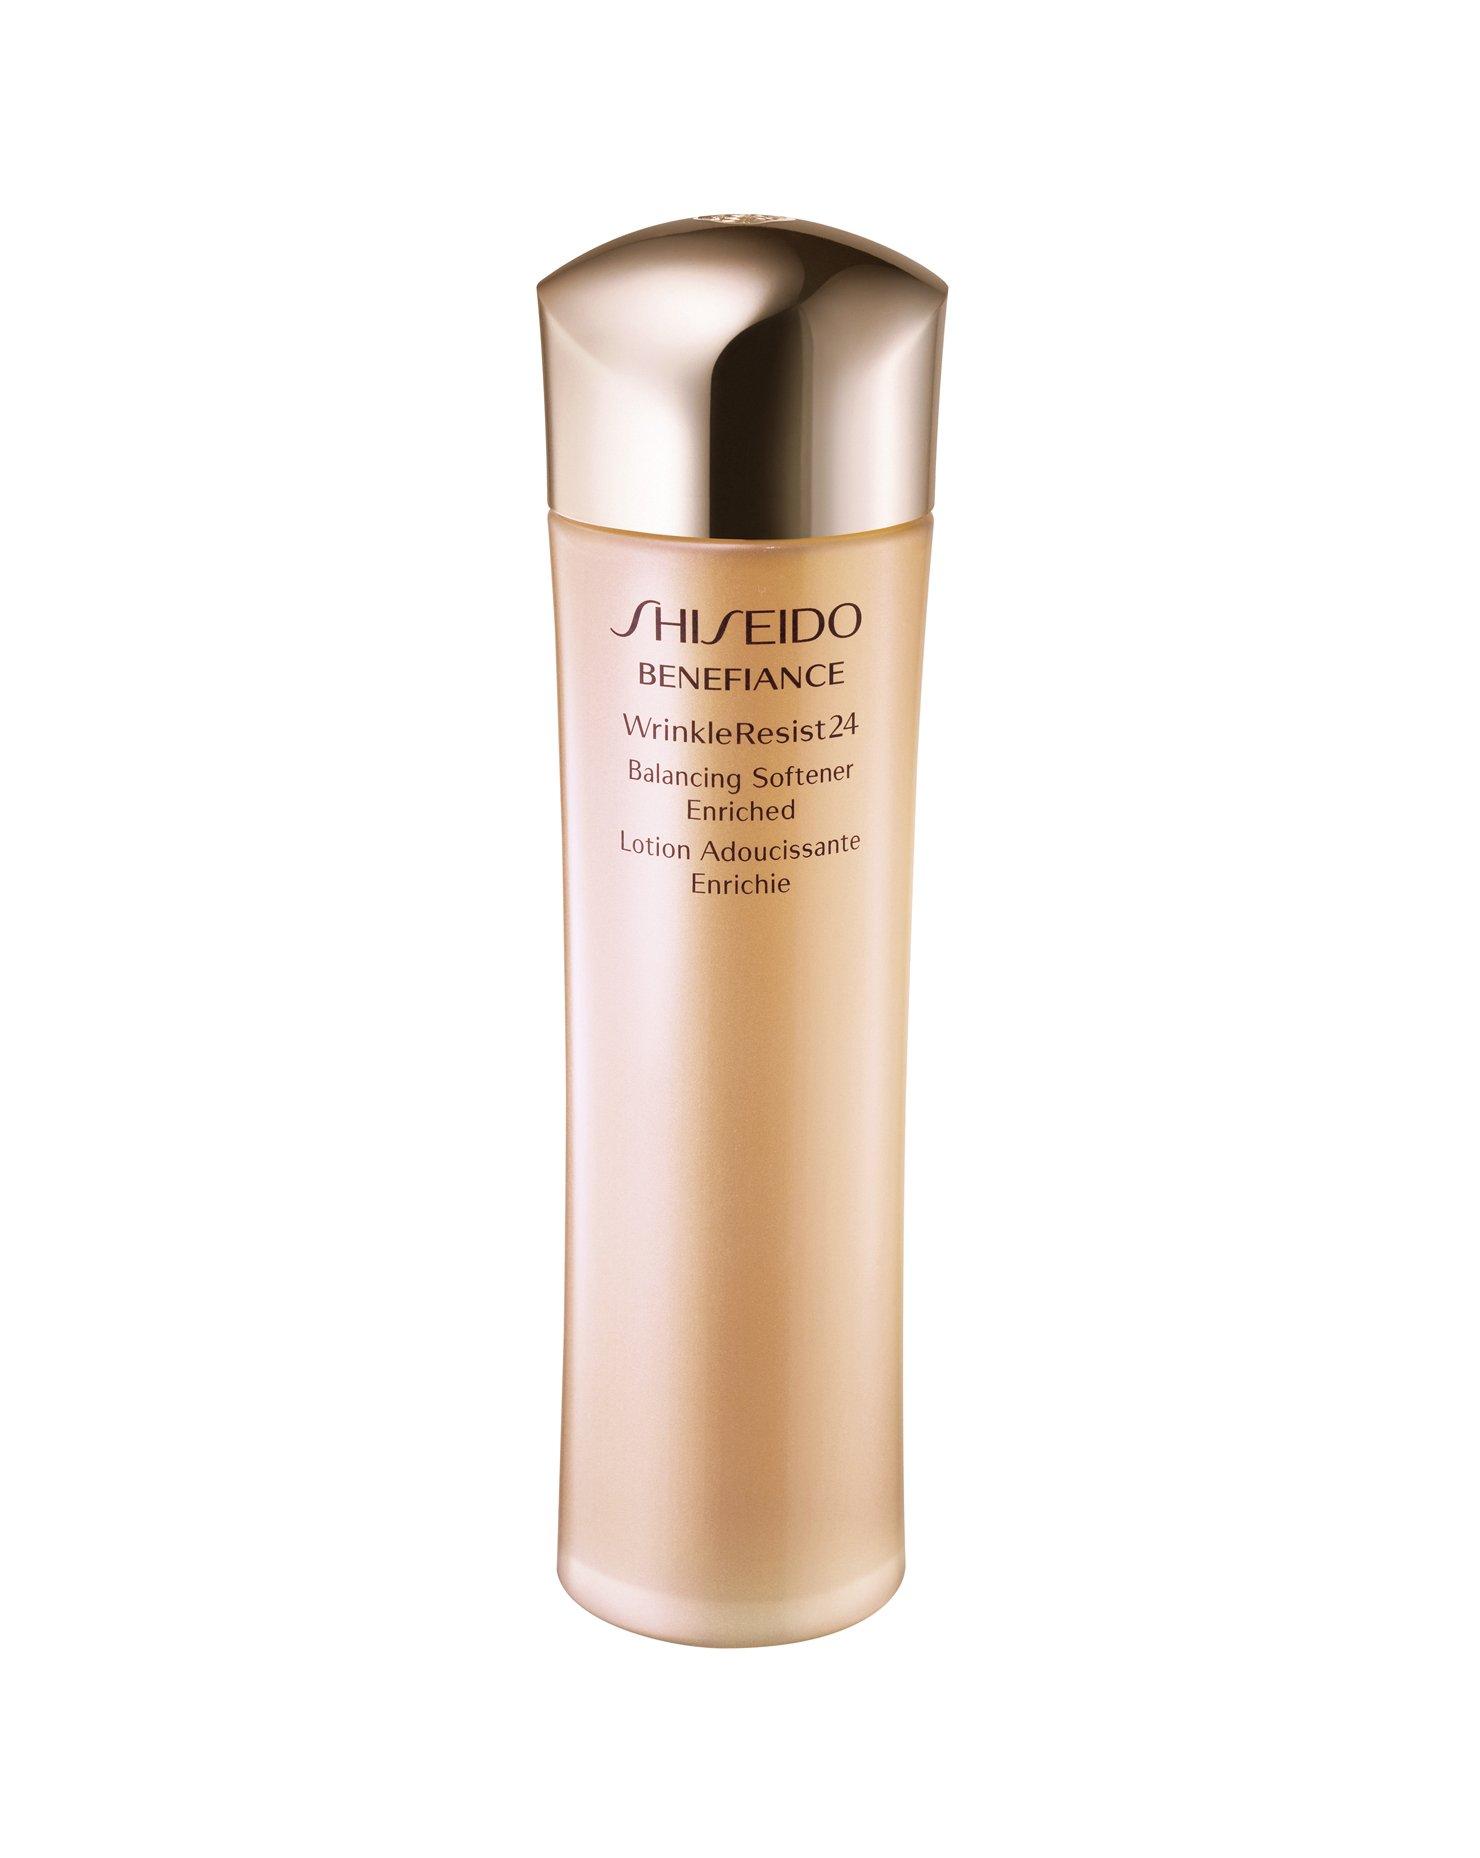 Shiseido Benefiance Wrinkleresist24 Balancing Softener Enriched for Unisex, 5 Ounce